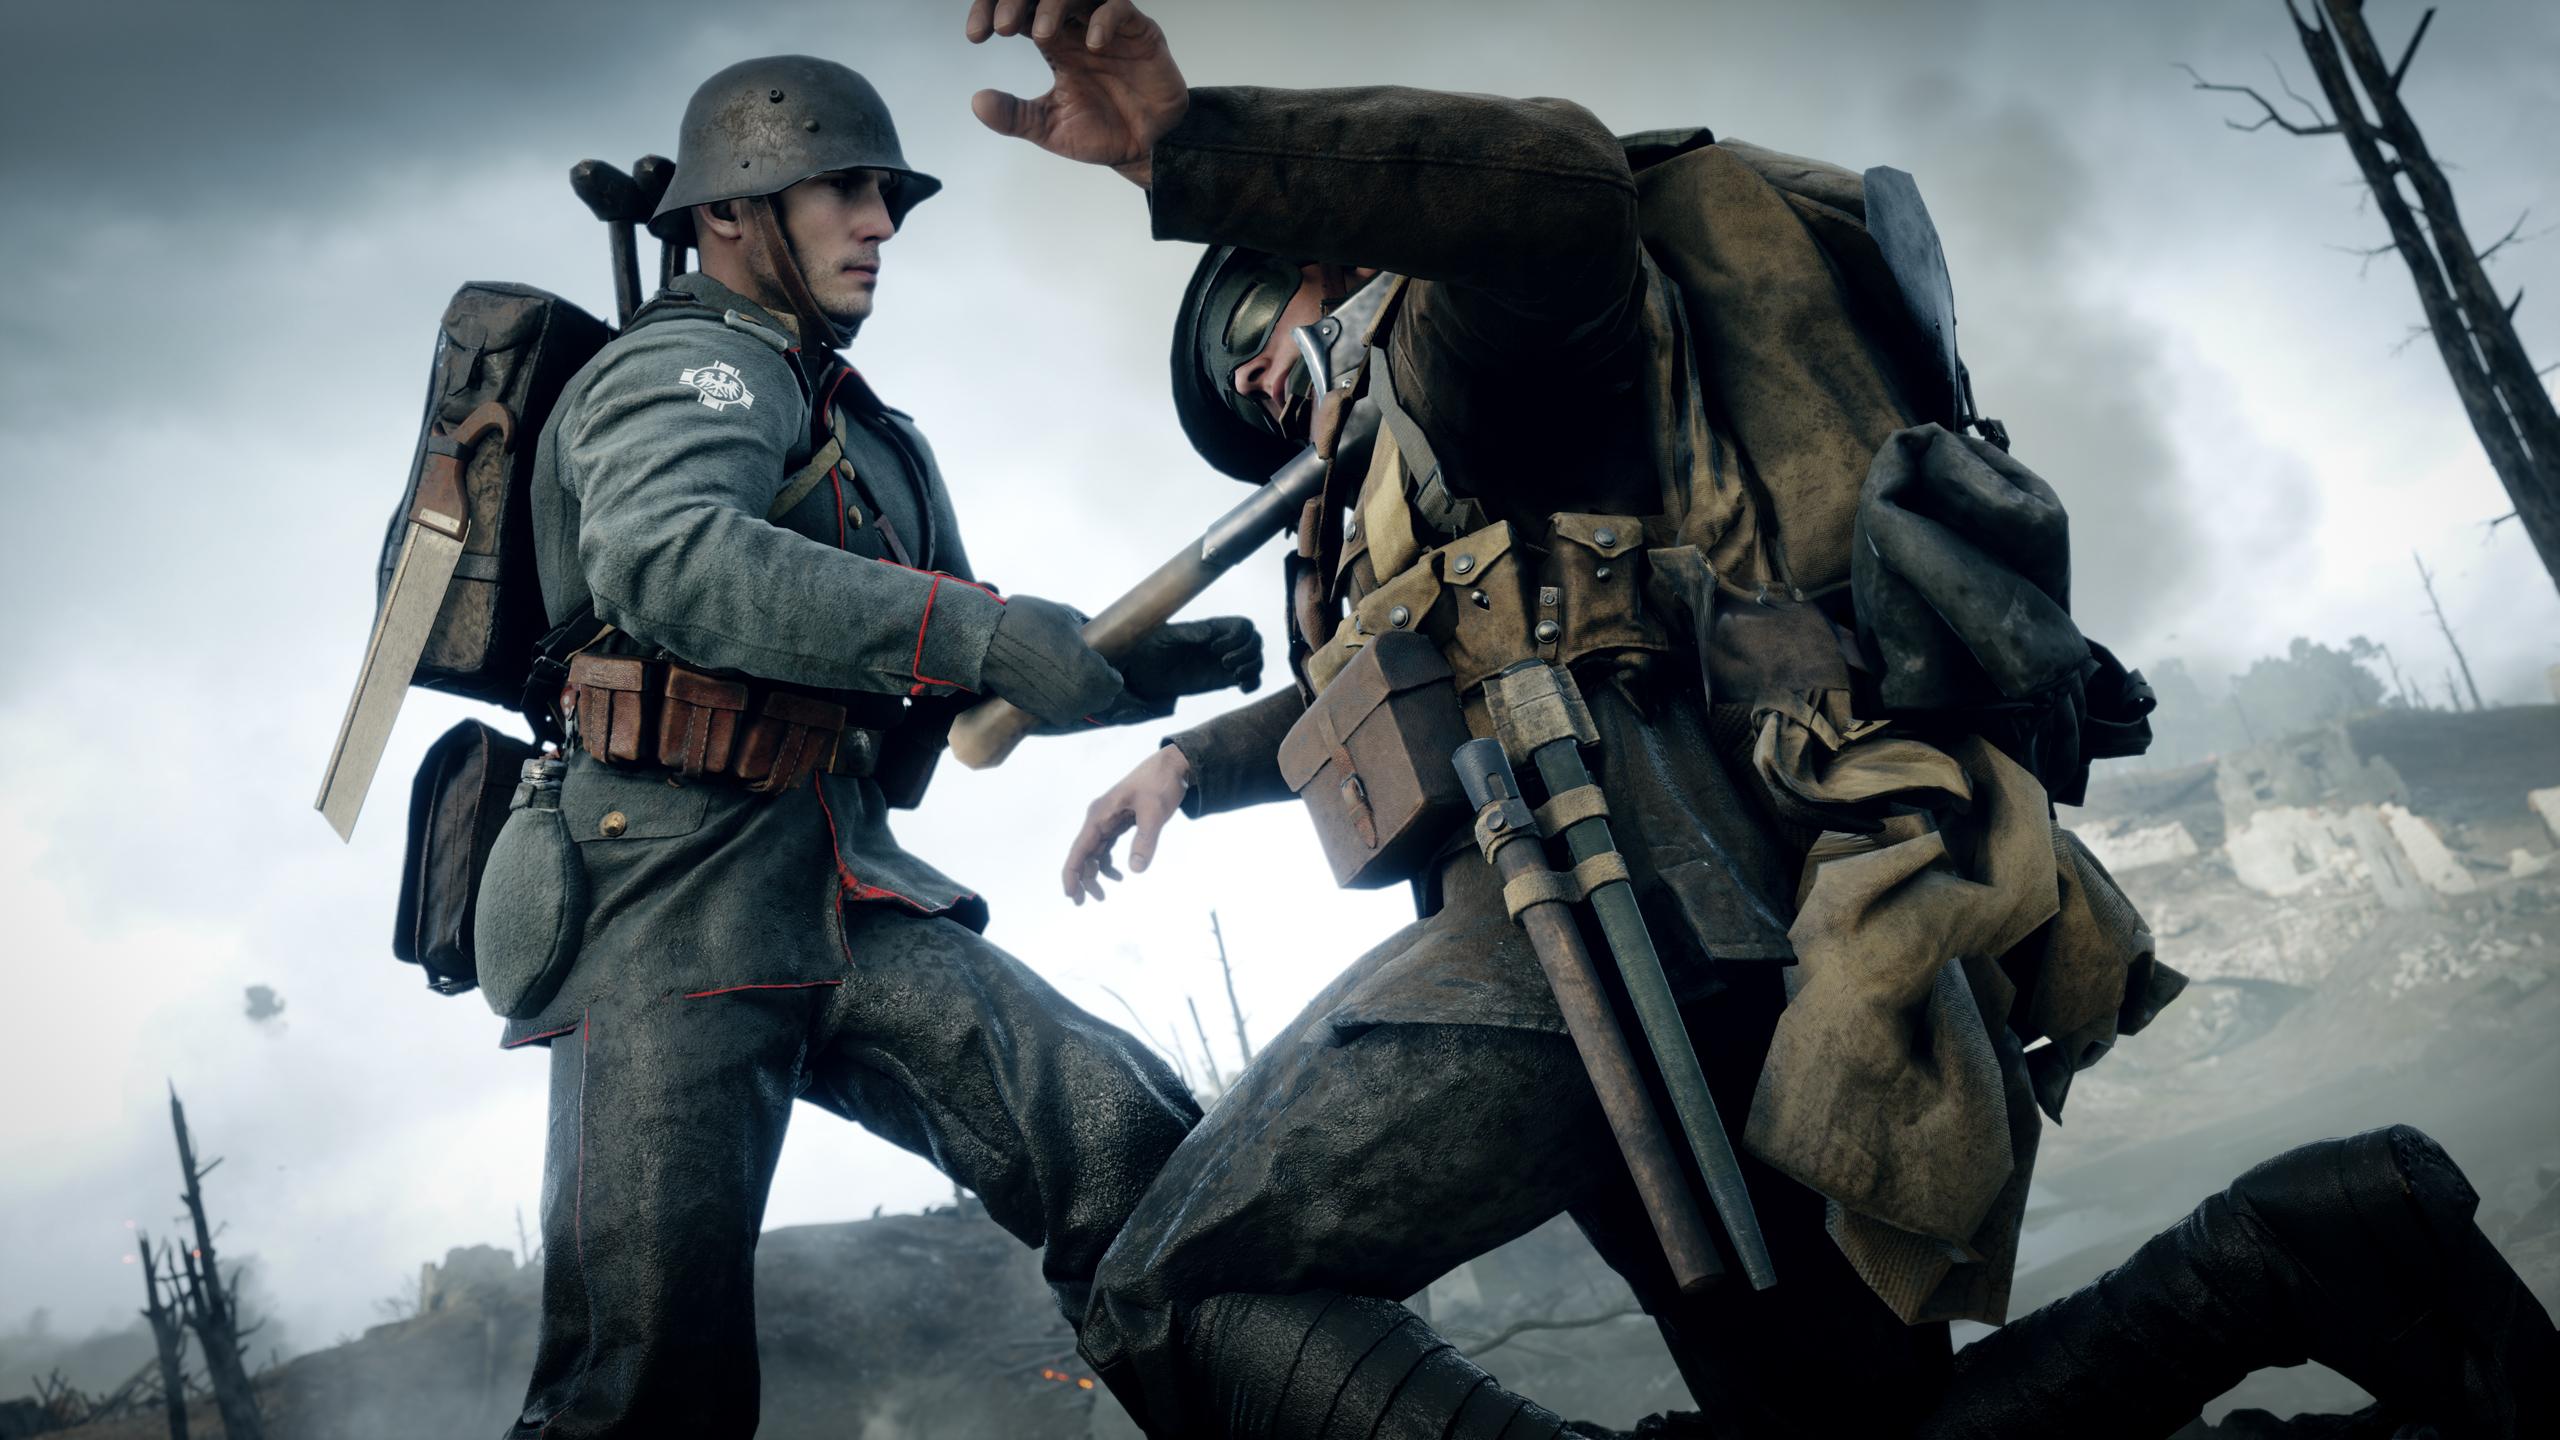 Battlefield 1 Best Ways To Get XP Amp Level Up Fast Ranks Guide Gameranx